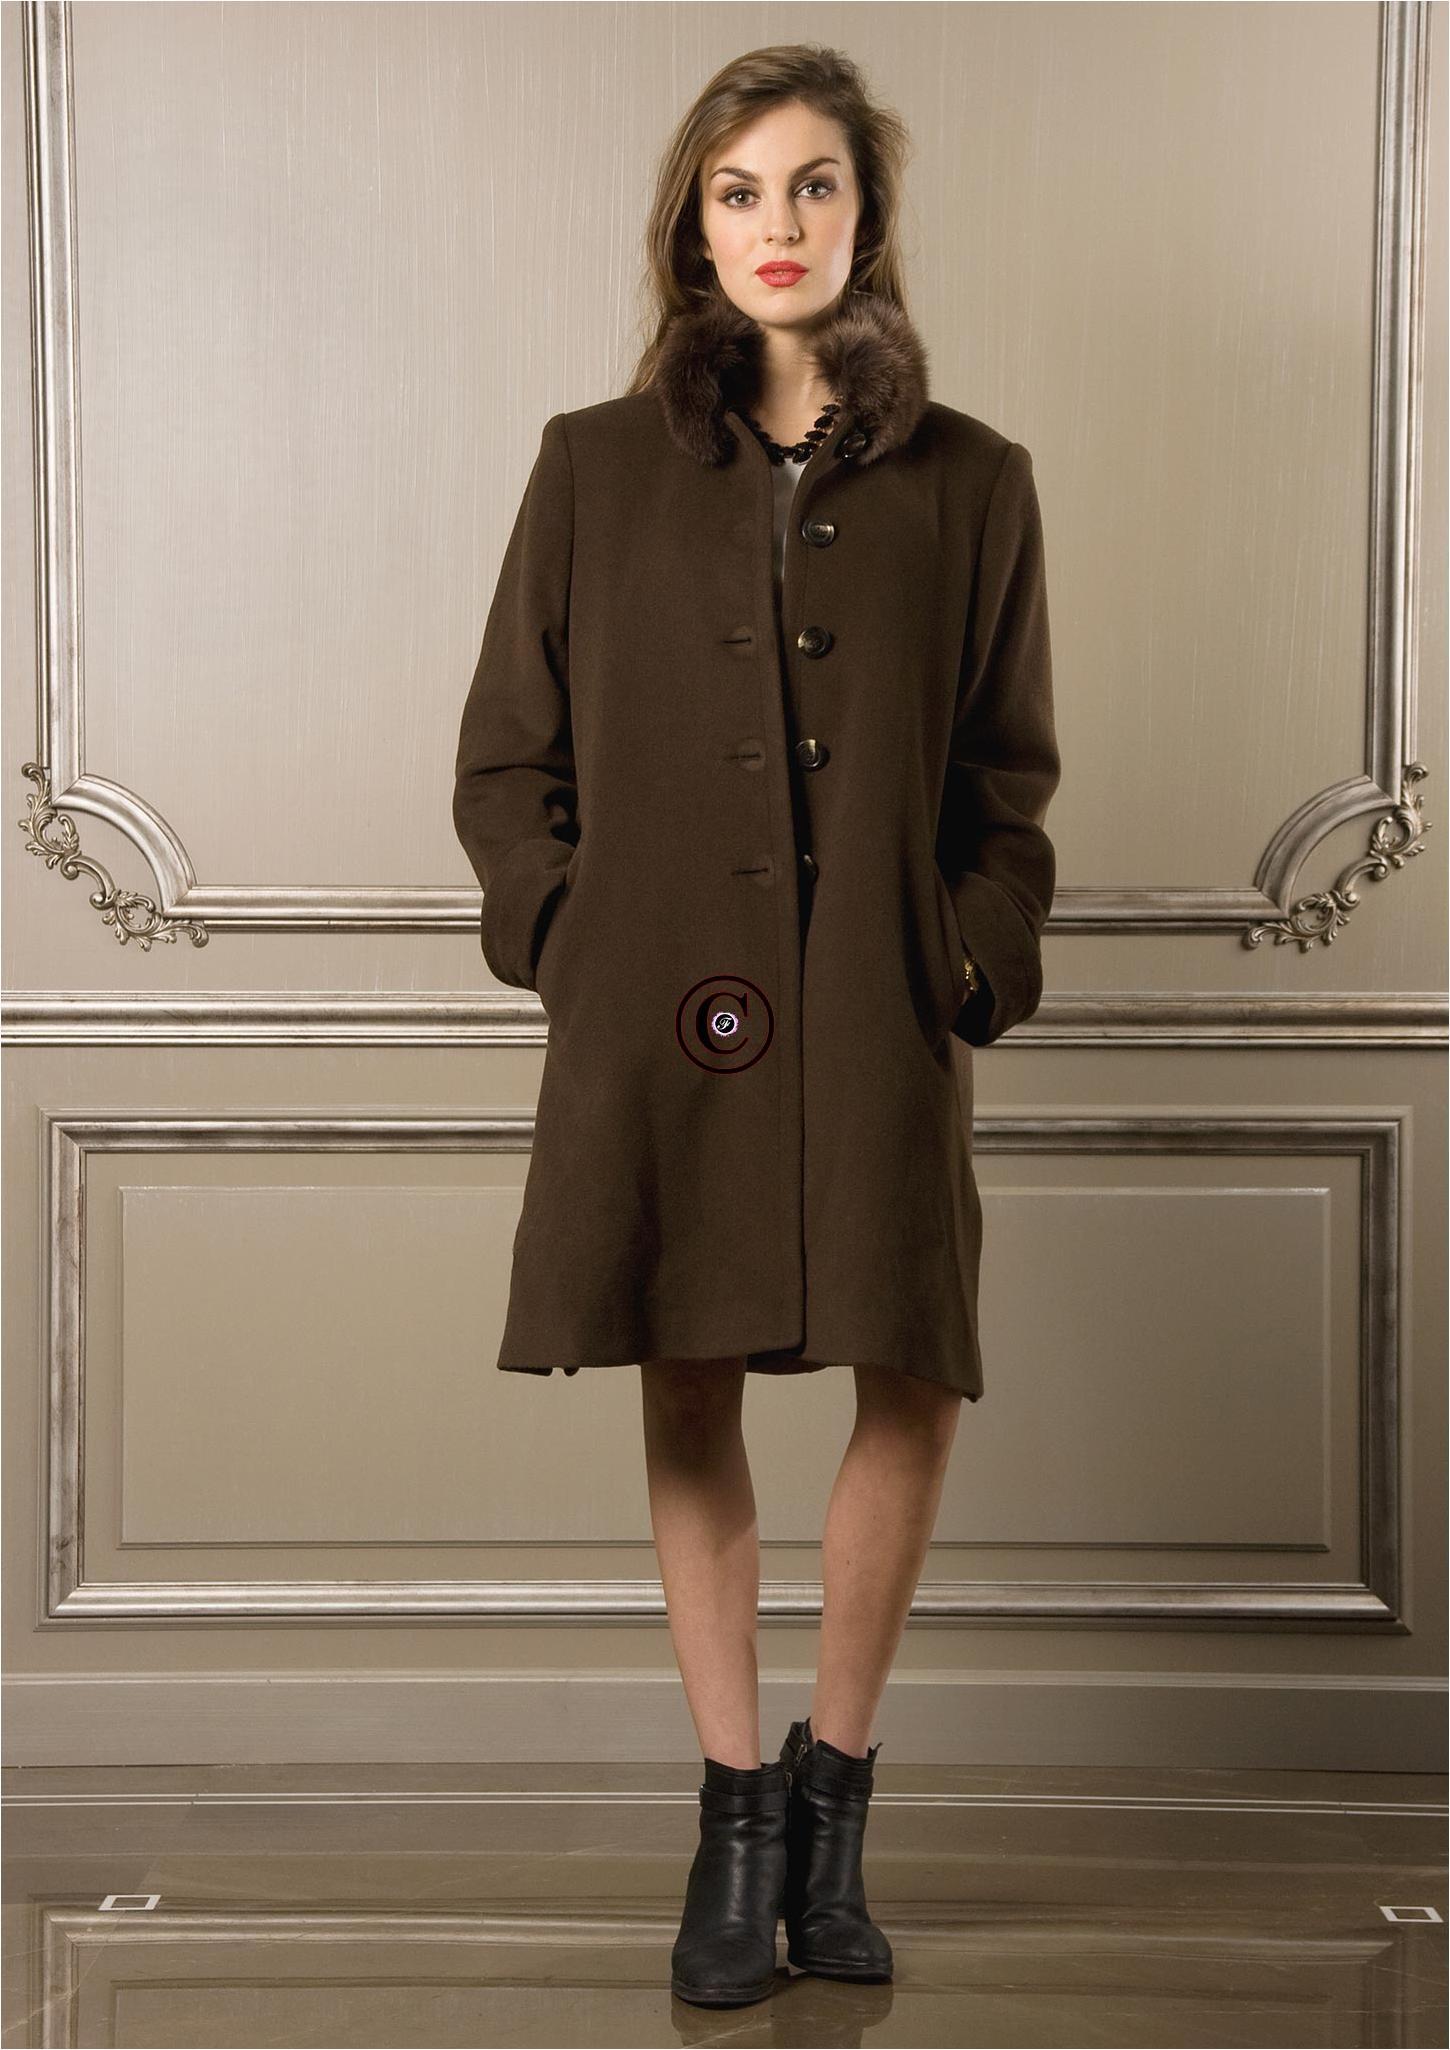 manteau marron osaka fourrure de renard. Black Bedroom Furniture Sets. Home Design Ideas